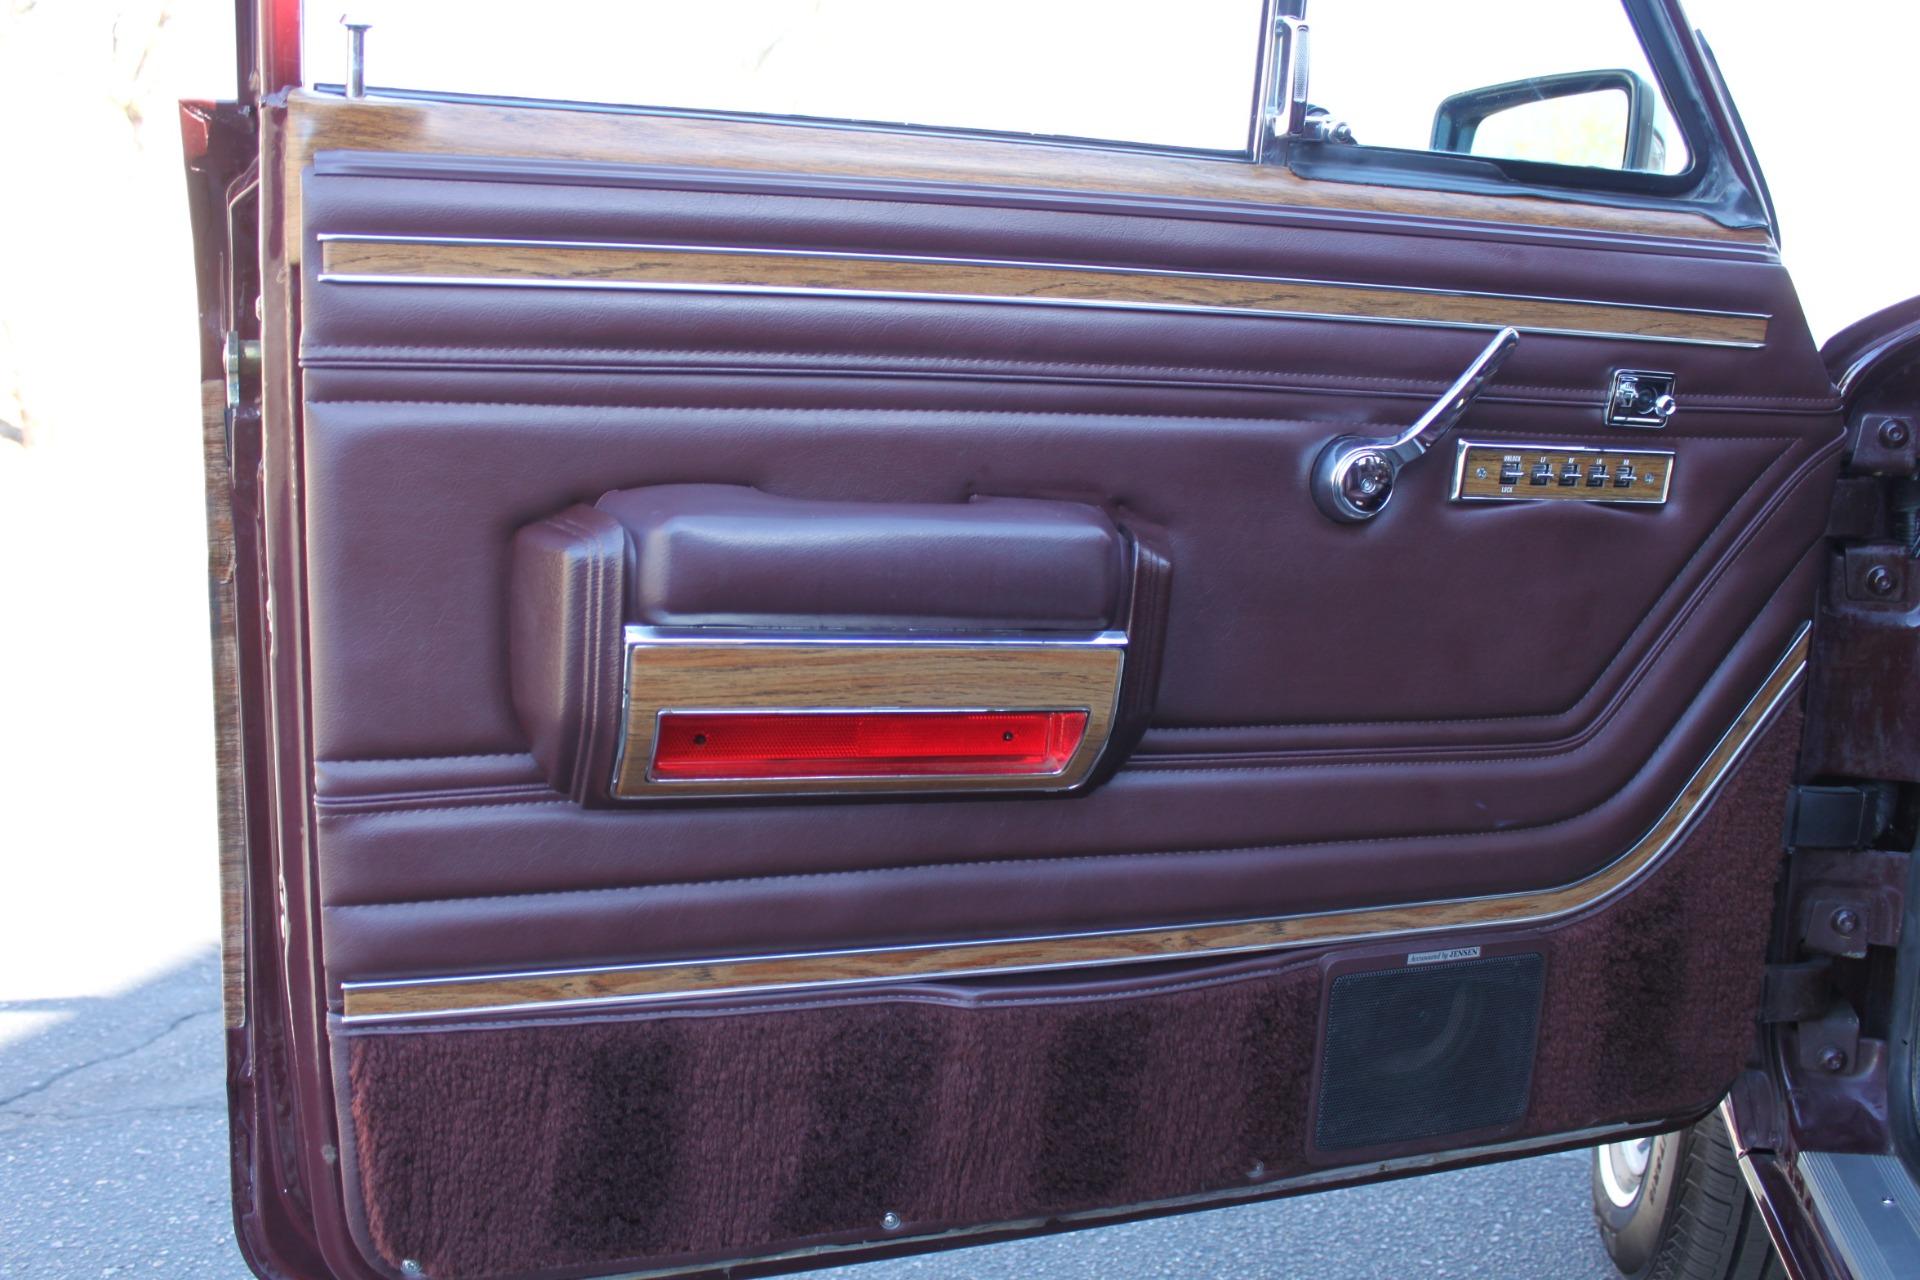 Used-1988-Jeep-Grand-Wagoneer-Jeep